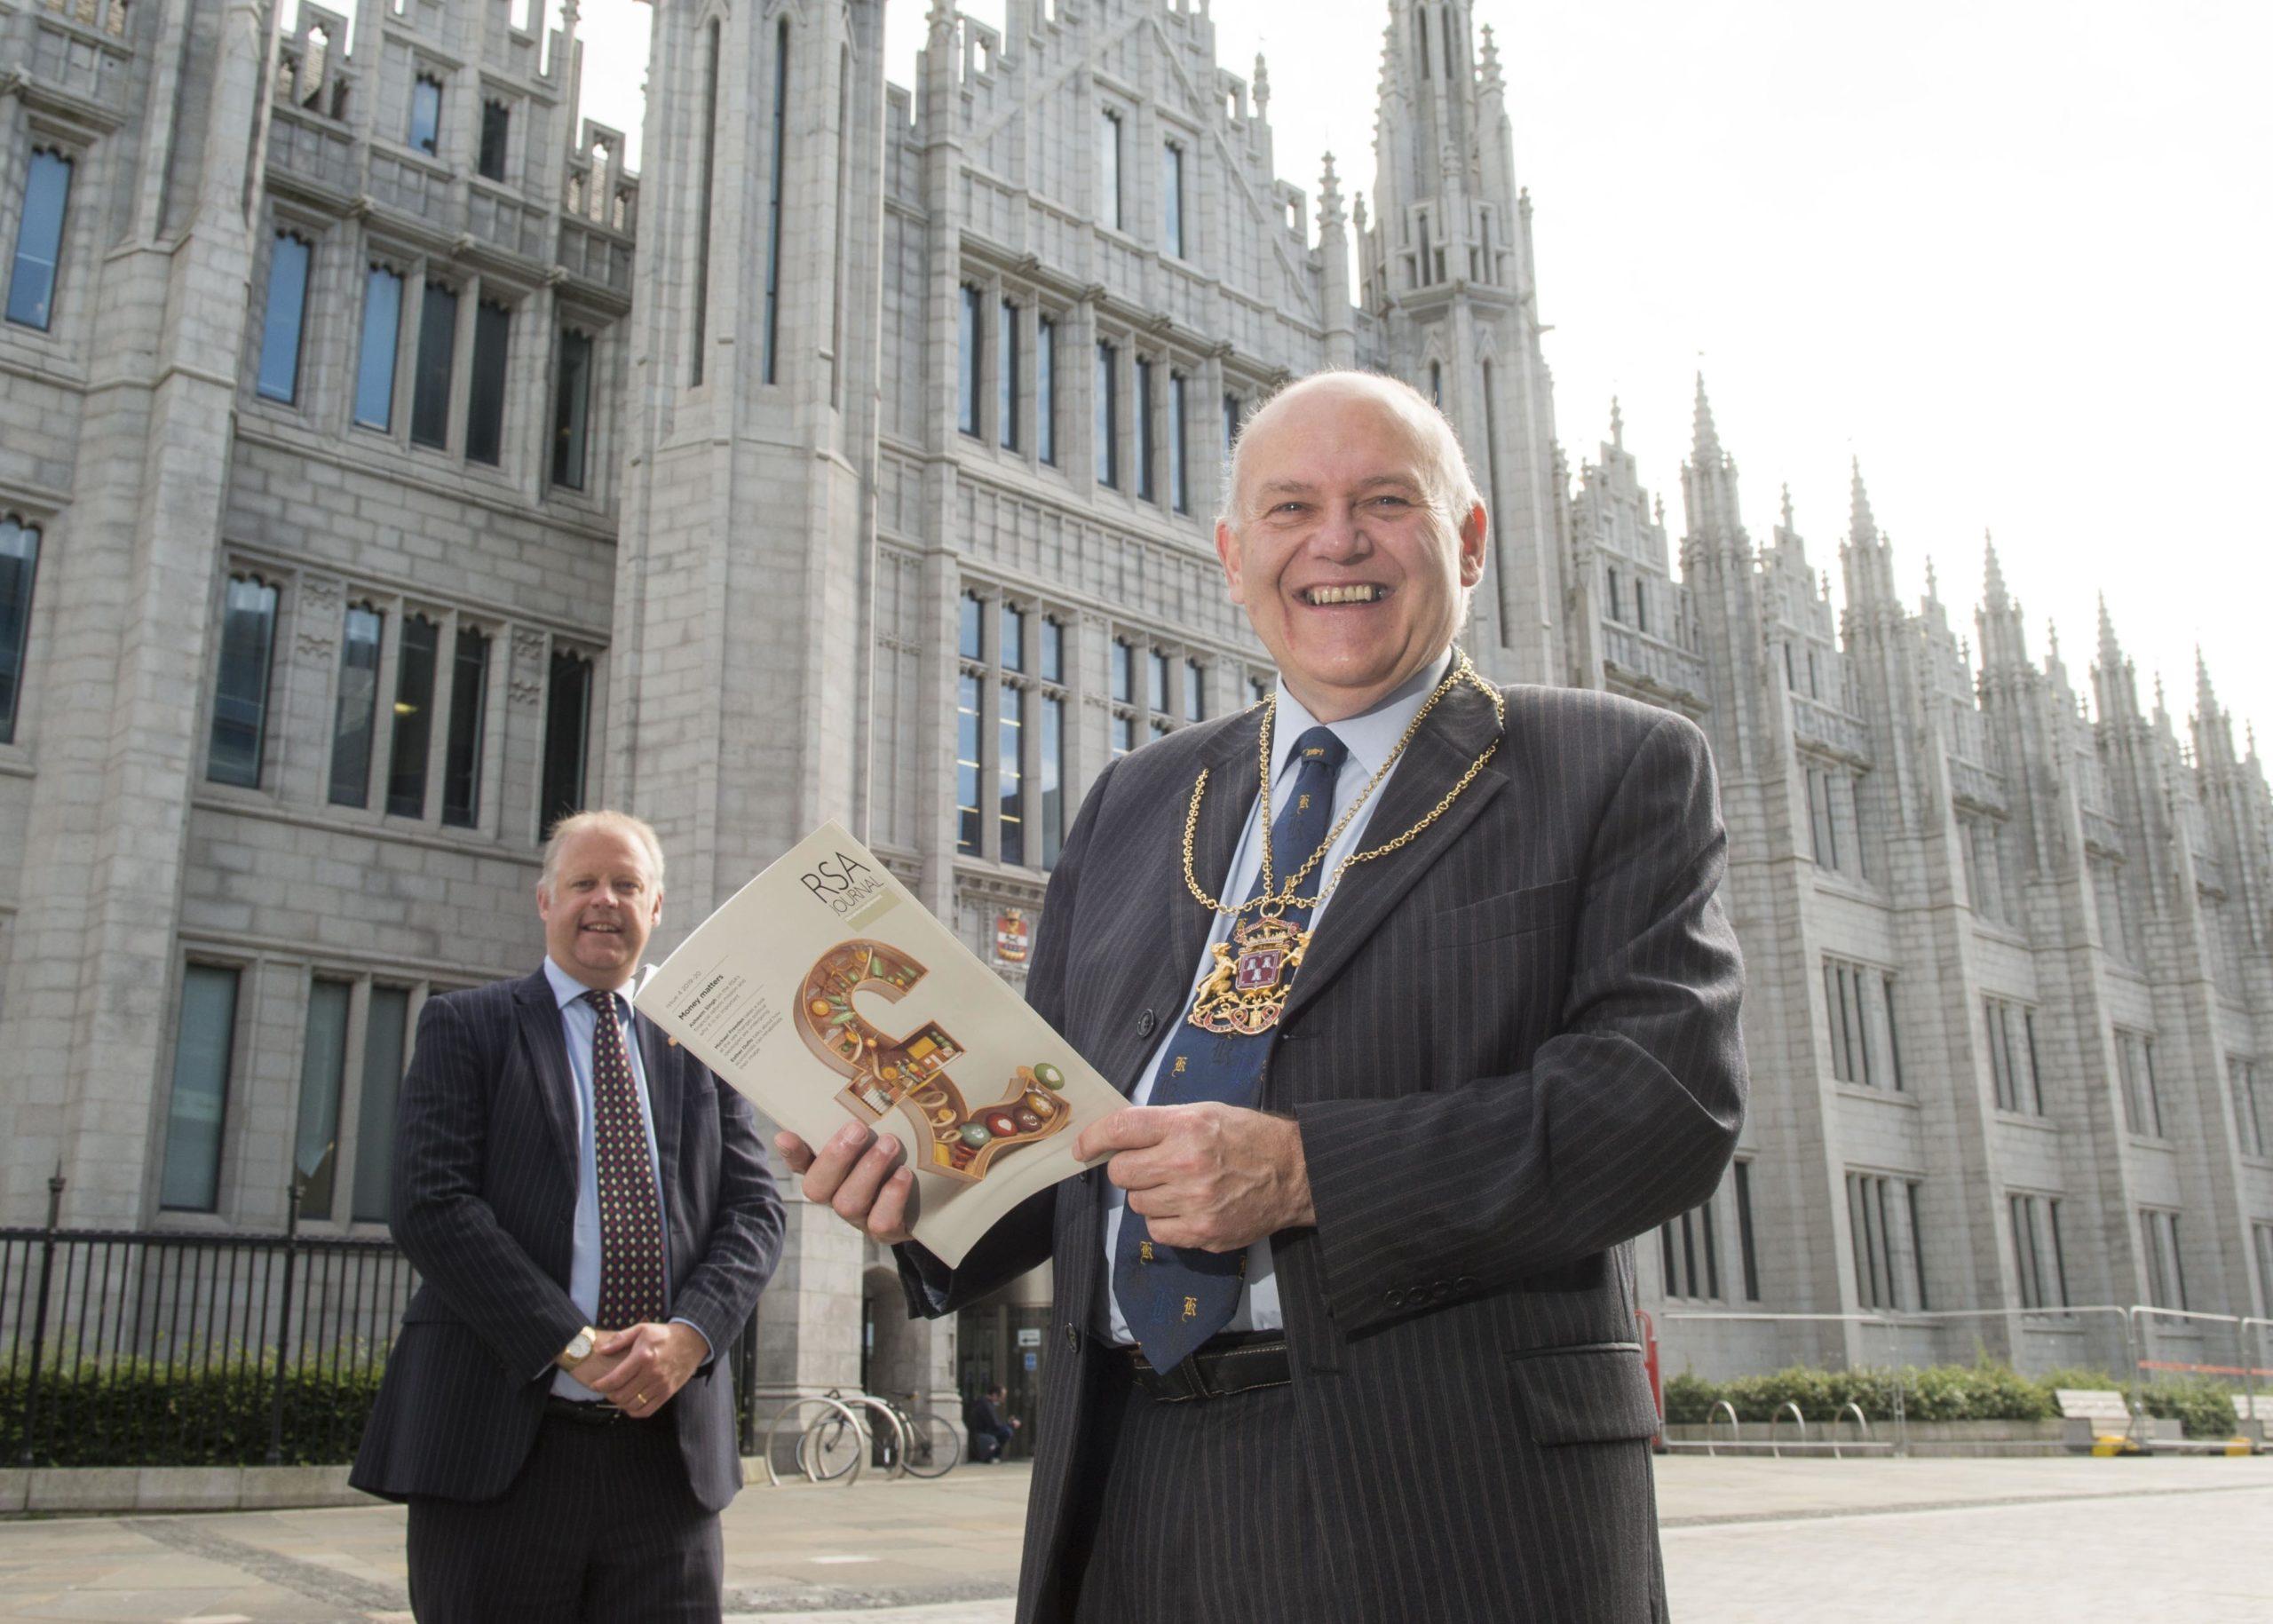 Fellowship councillor and Aberdeen University lecturer Neil McLennan and Lord Provost of Aberdeen Barney Crockett (right).